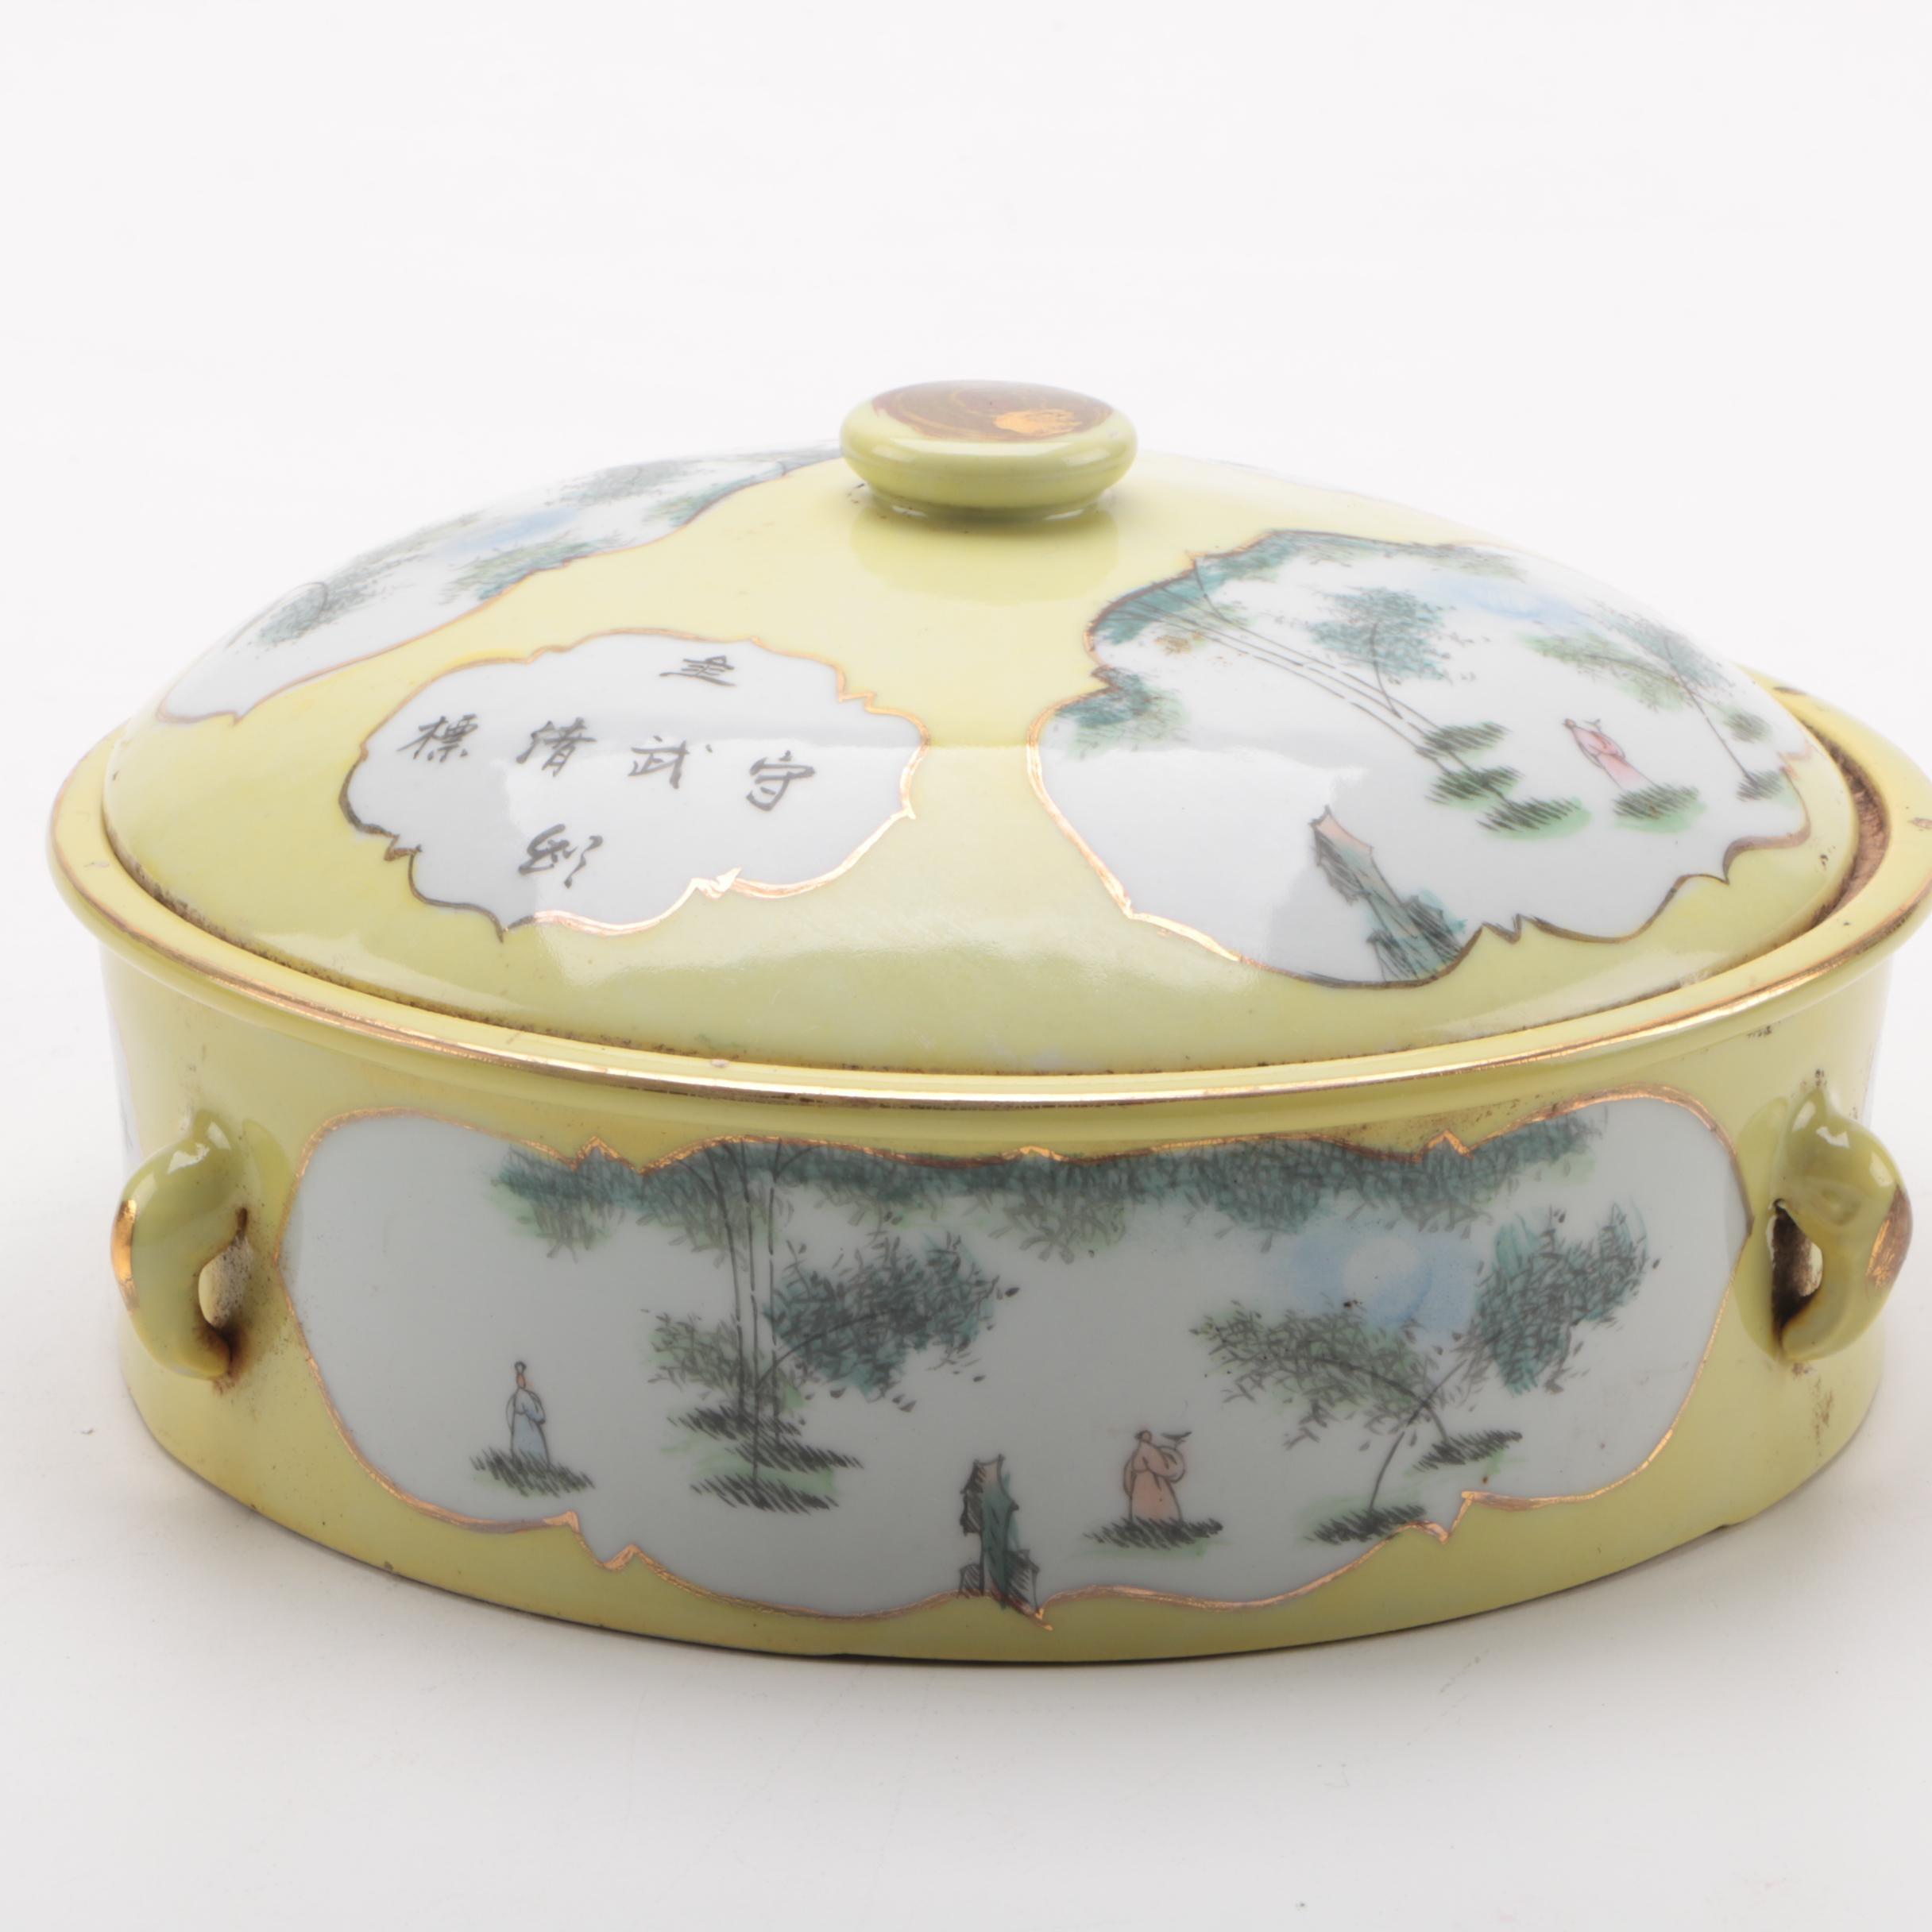 Chinese Ceramic Lidded Dish